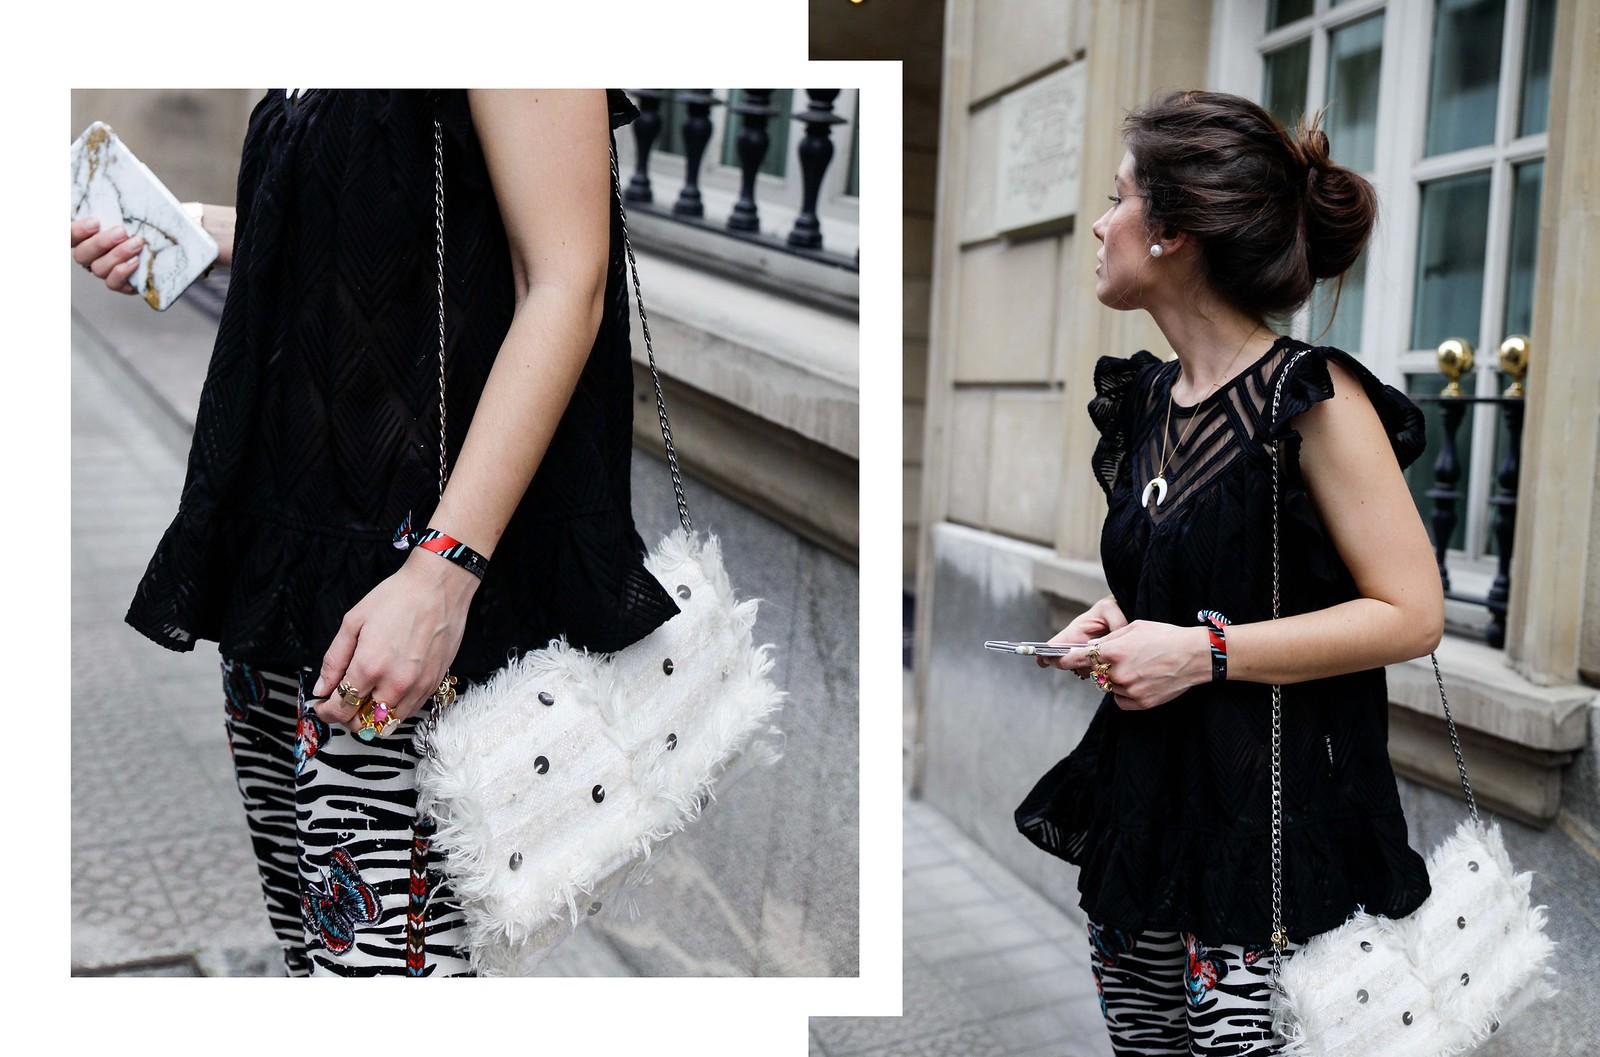 014_Pantalones_Zebra_Blusa_Boho_tacones_rosas_stradivarius_Theguestgirl_outfit_barcelona_streetstyle